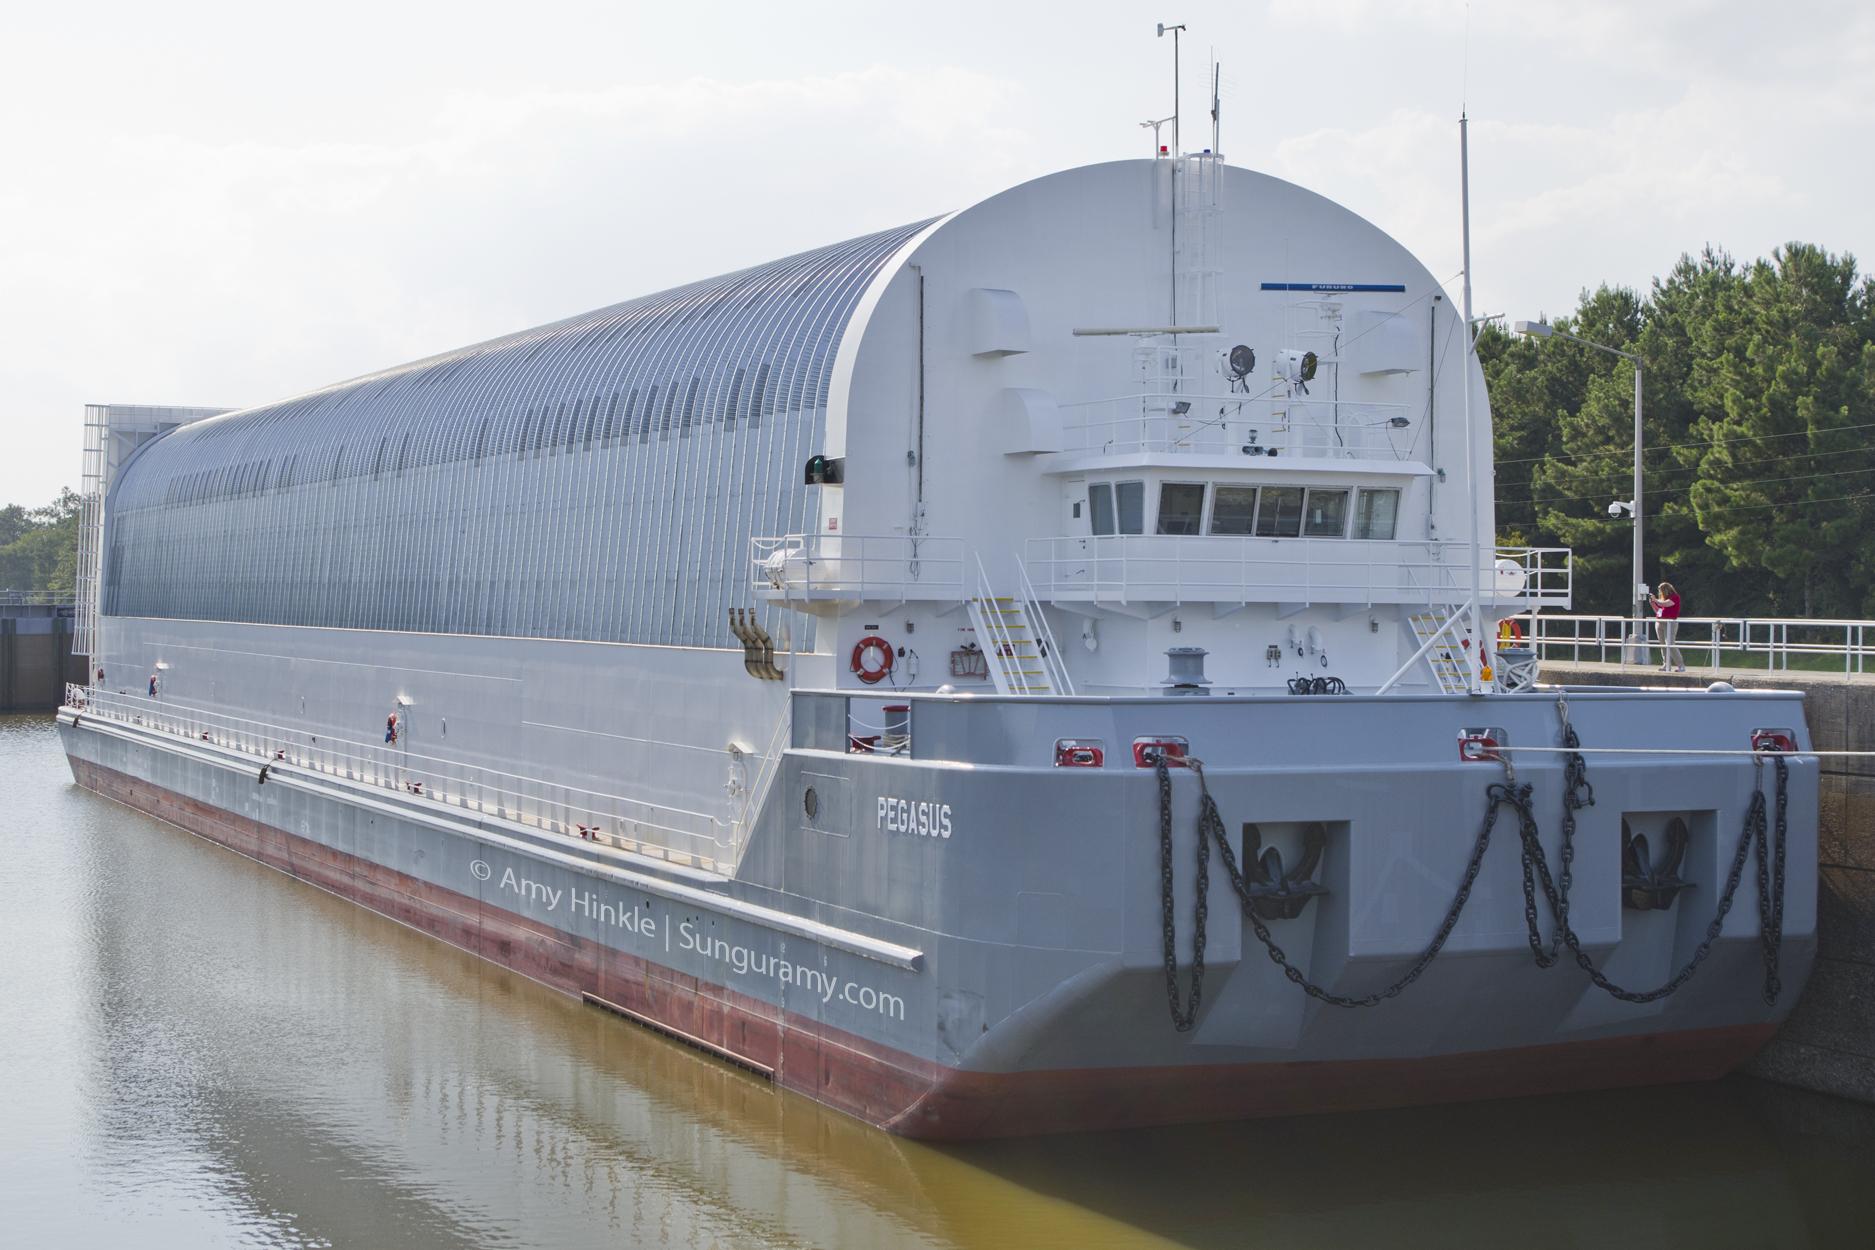 Ocean transport barge - For NASA